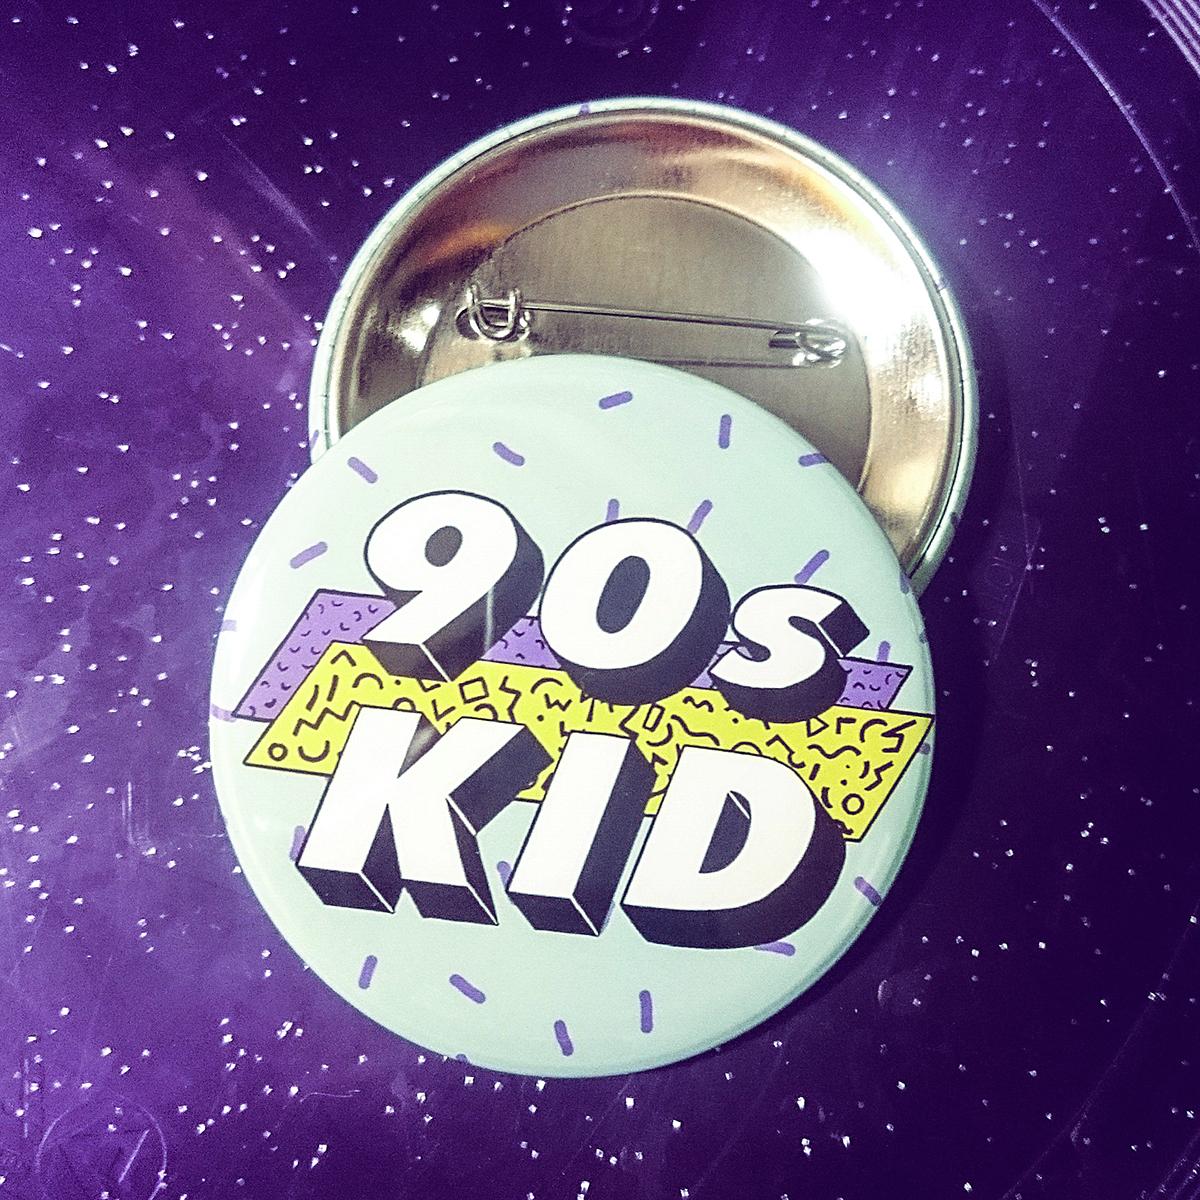 90s 90ies 90skid 90sbaby tshirt streetwear 90sgraphic shirt bag